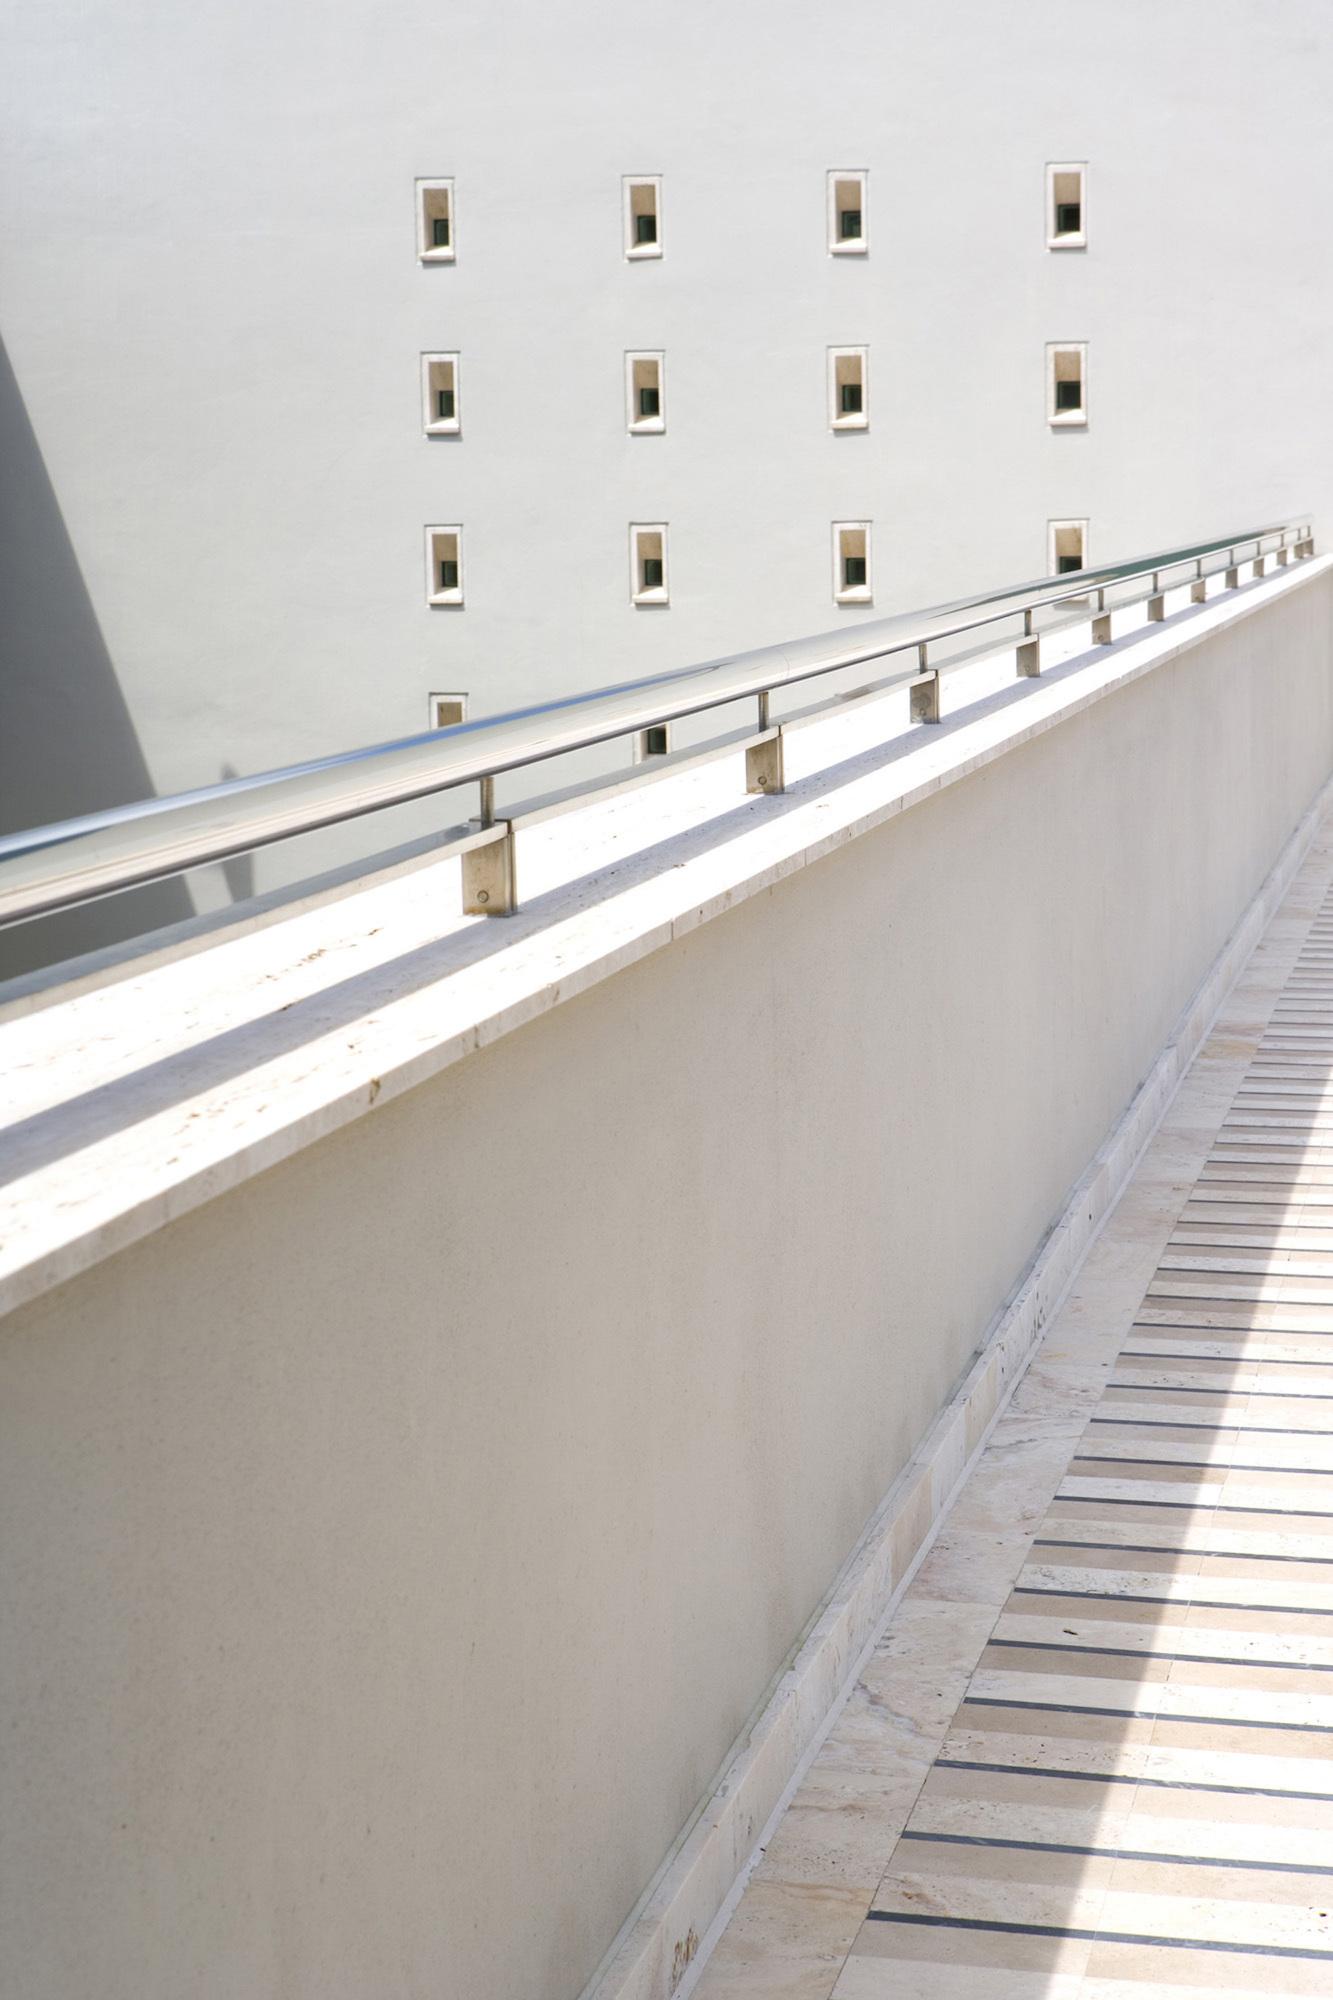 residencia-tavernier-drive-luis-pons-design-lab_chayane_house_032607_035